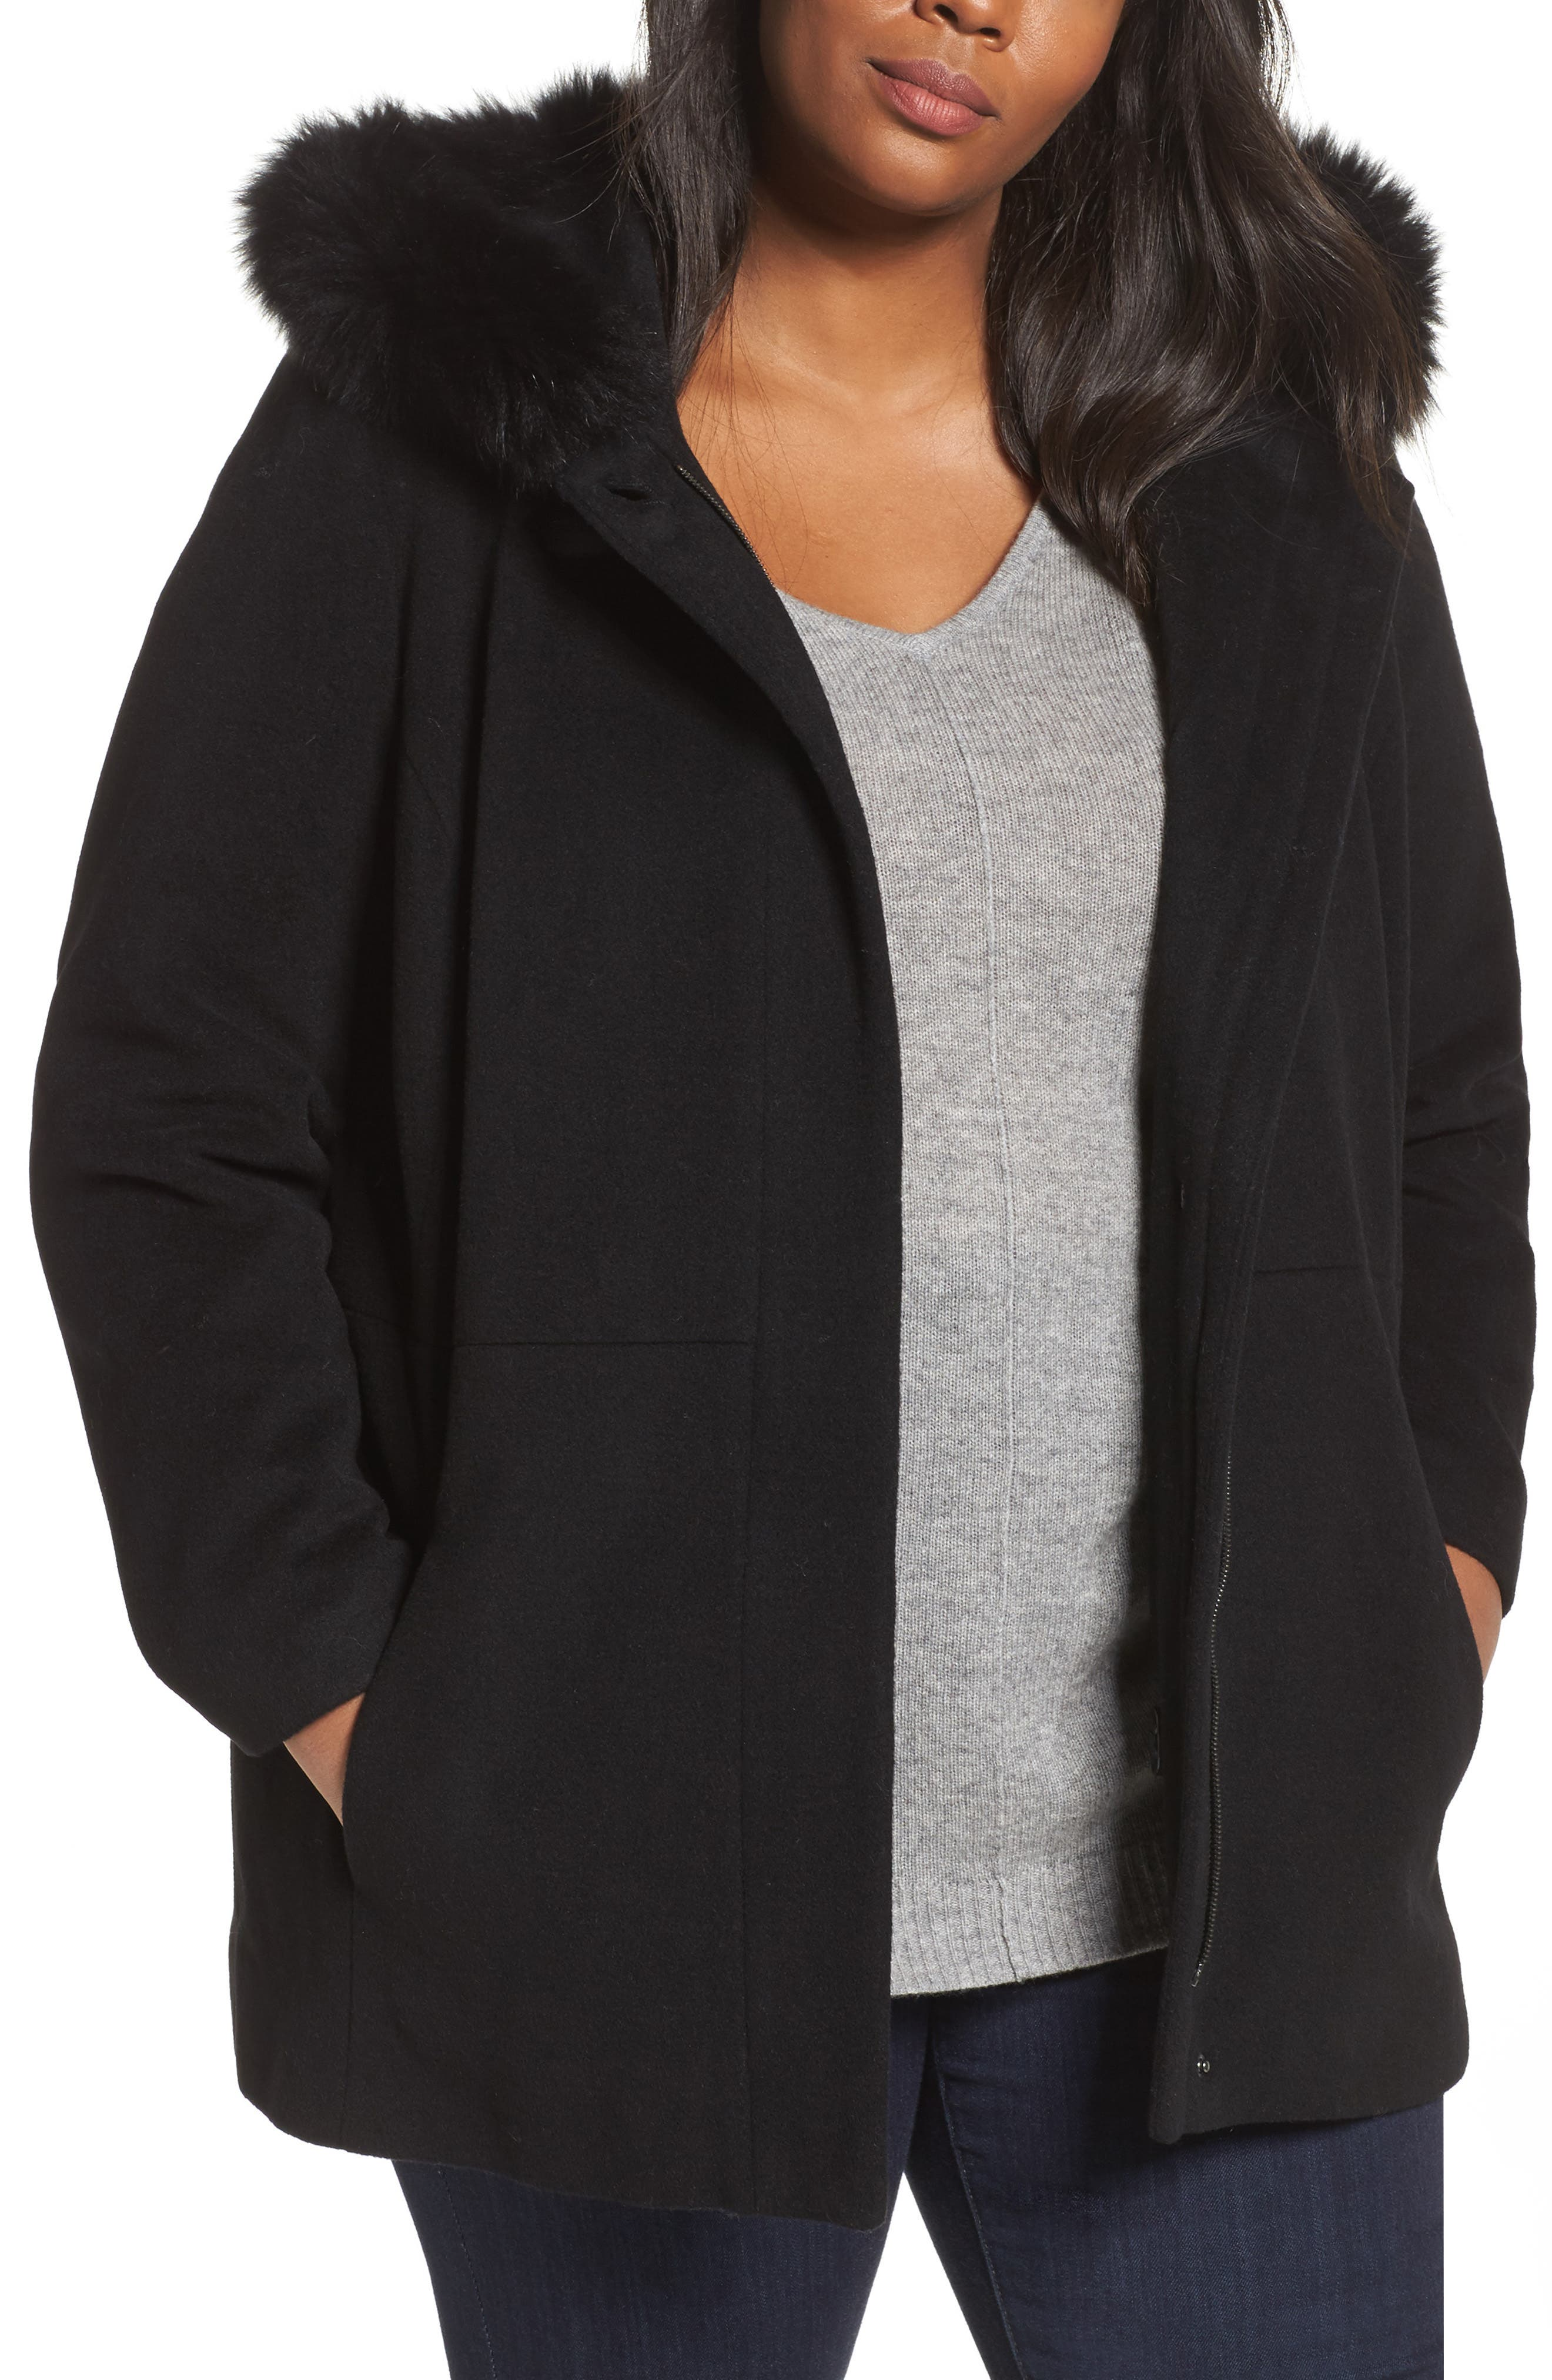 Main Image - Sachi Genuine Fox Fur Trim Hooded Wool Blend Jacket (Plus Size)